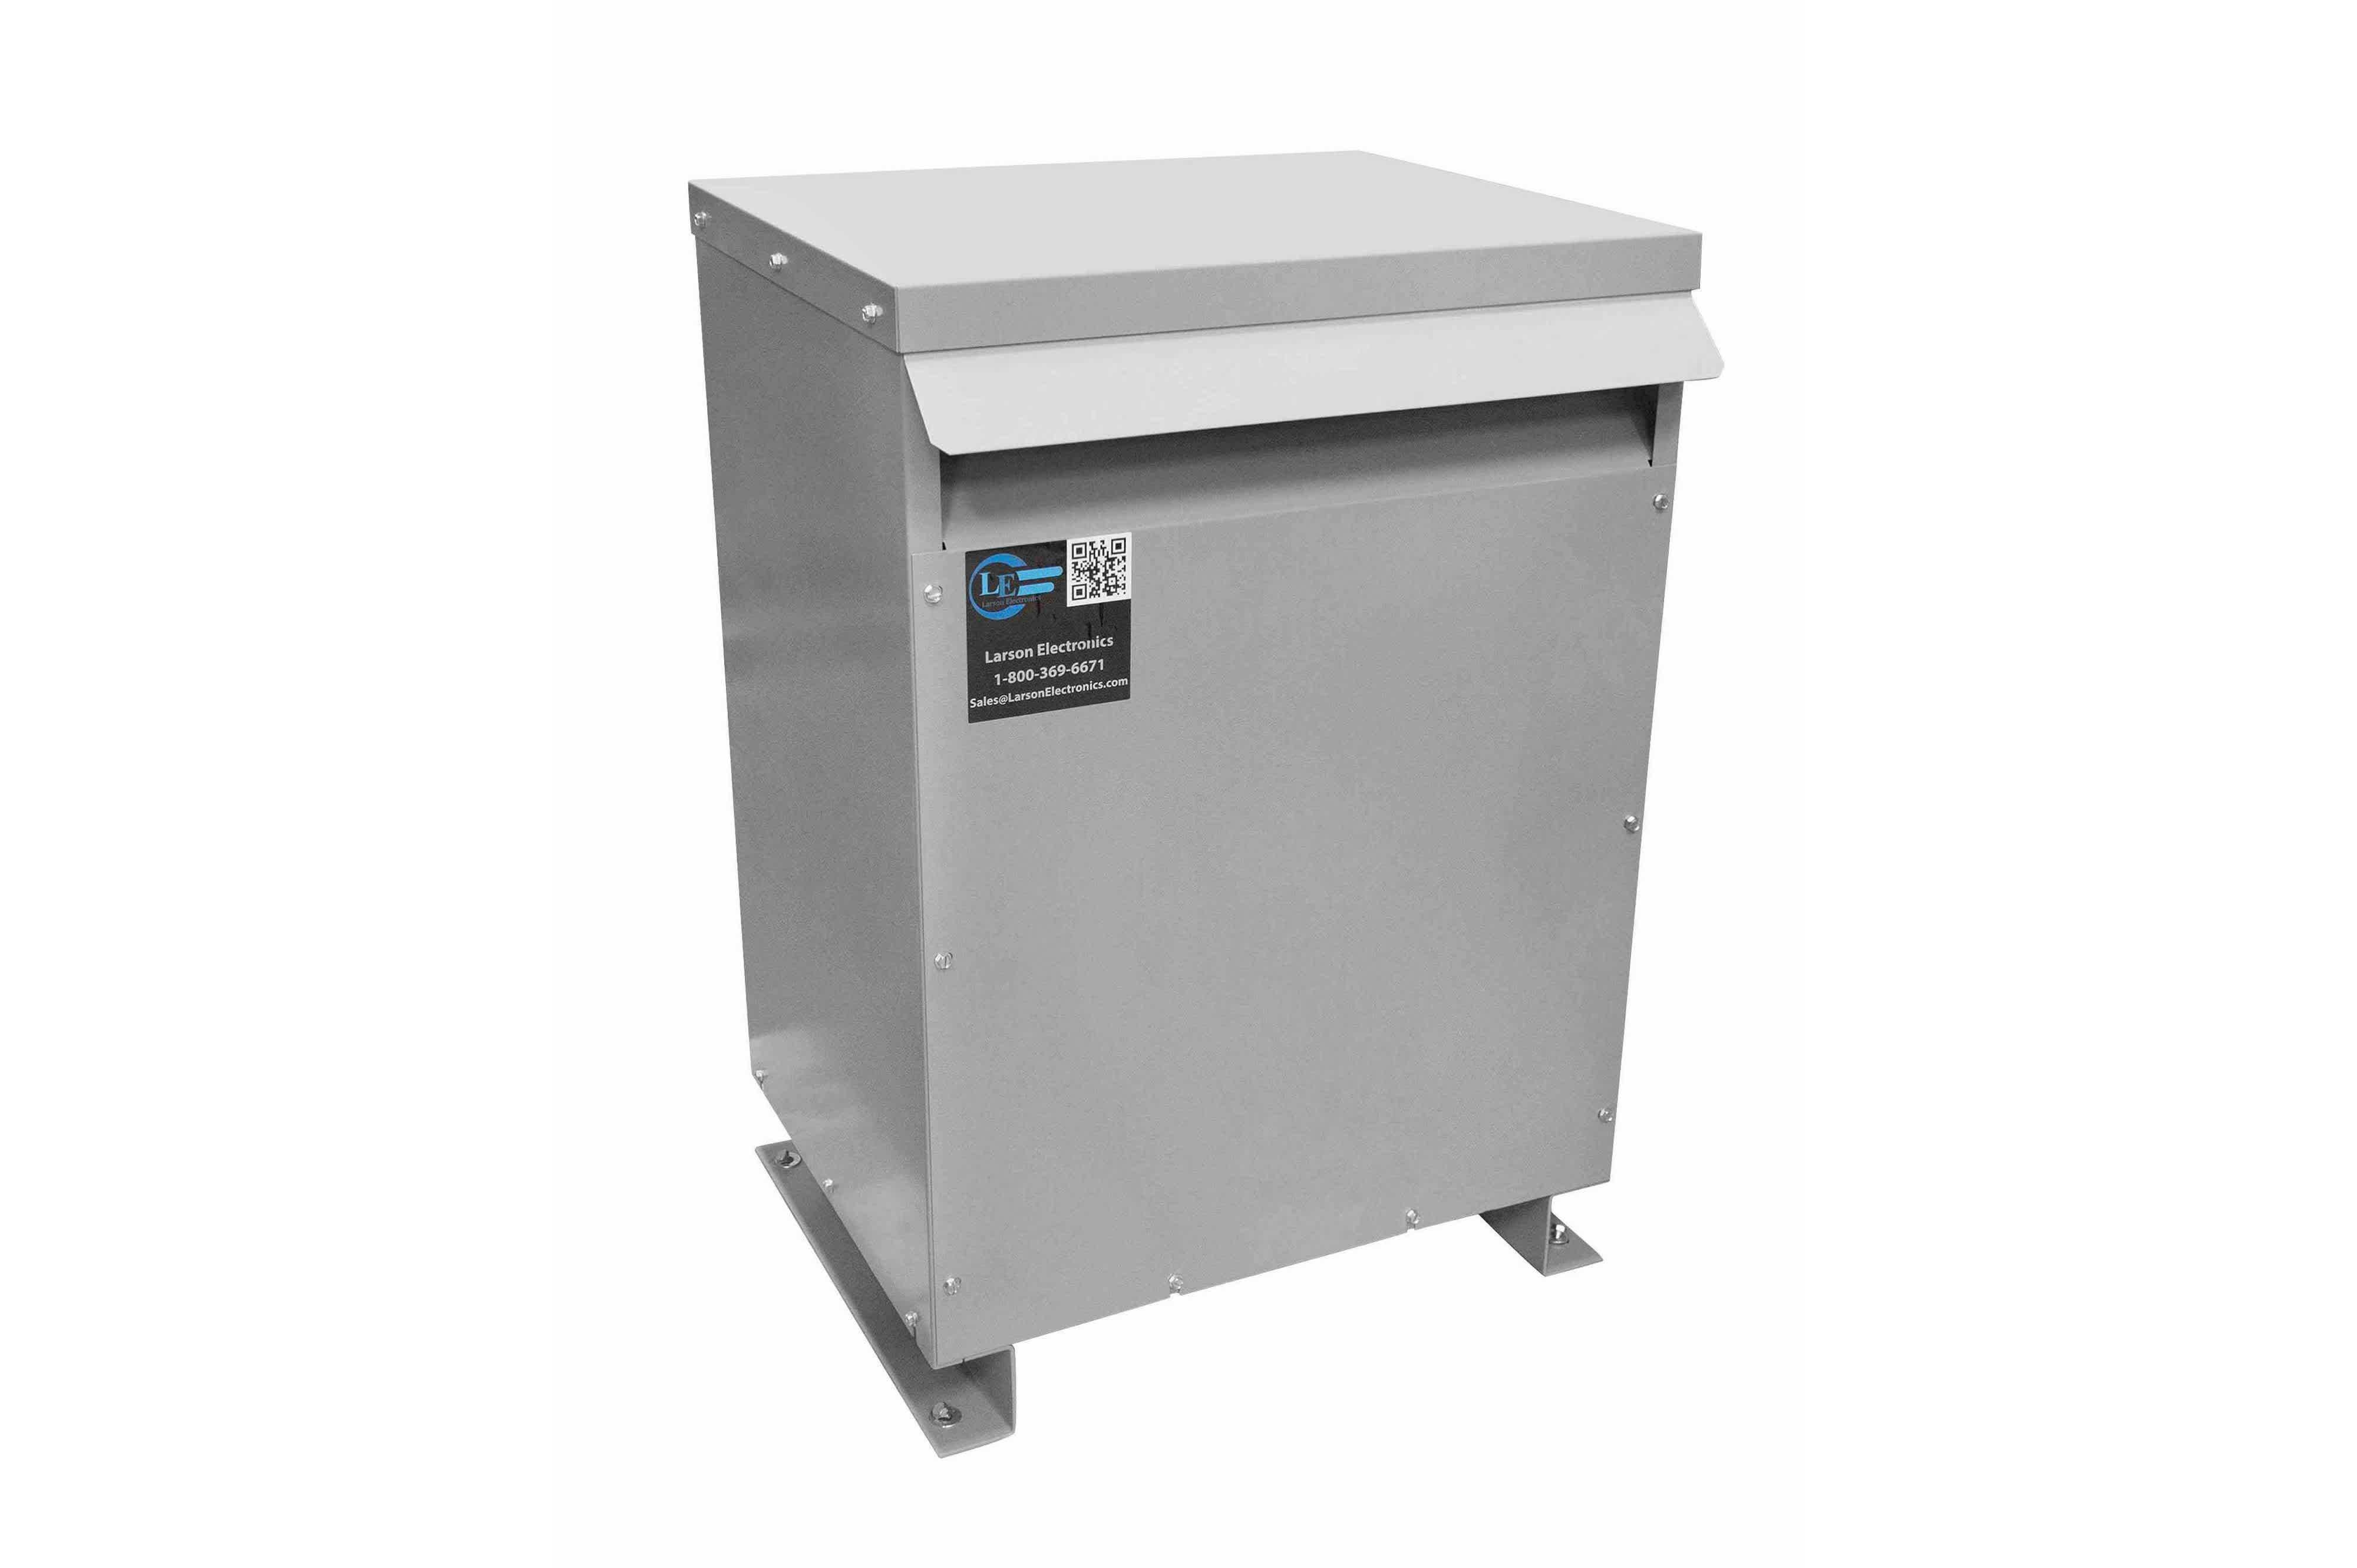 80 kVA 3PH Isolation Transformer, 600V Wye Primary, 460Y/266 Wye-N Secondary, N3R, Ventilated, 60 Hz